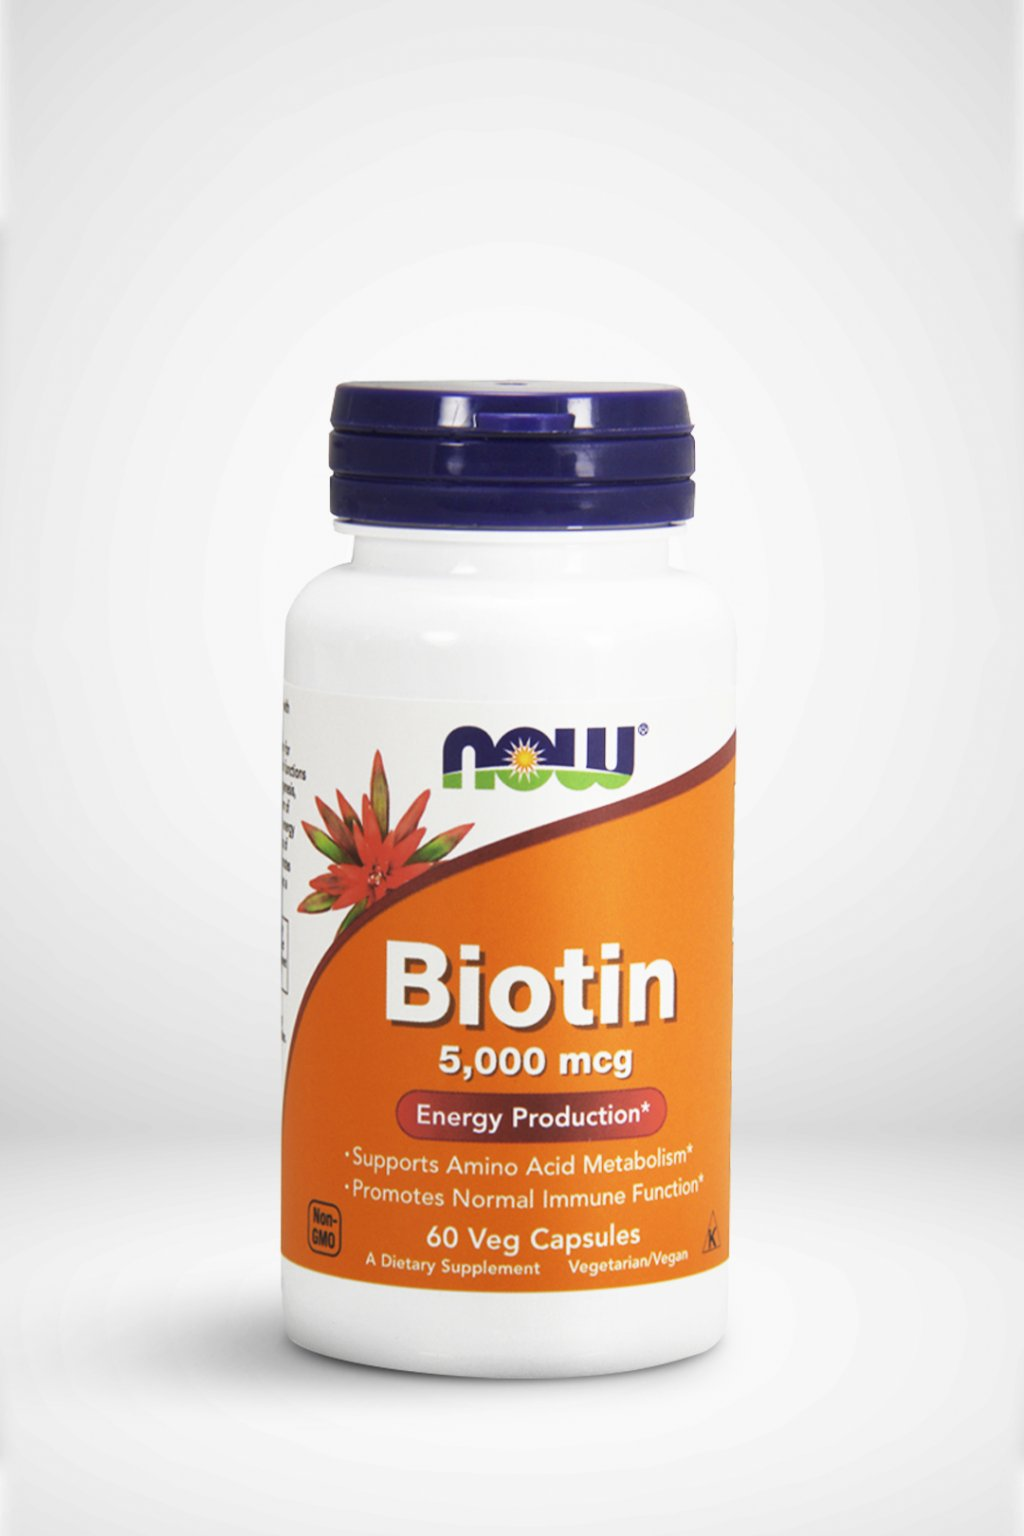 NZ Biotin 1080x1620px